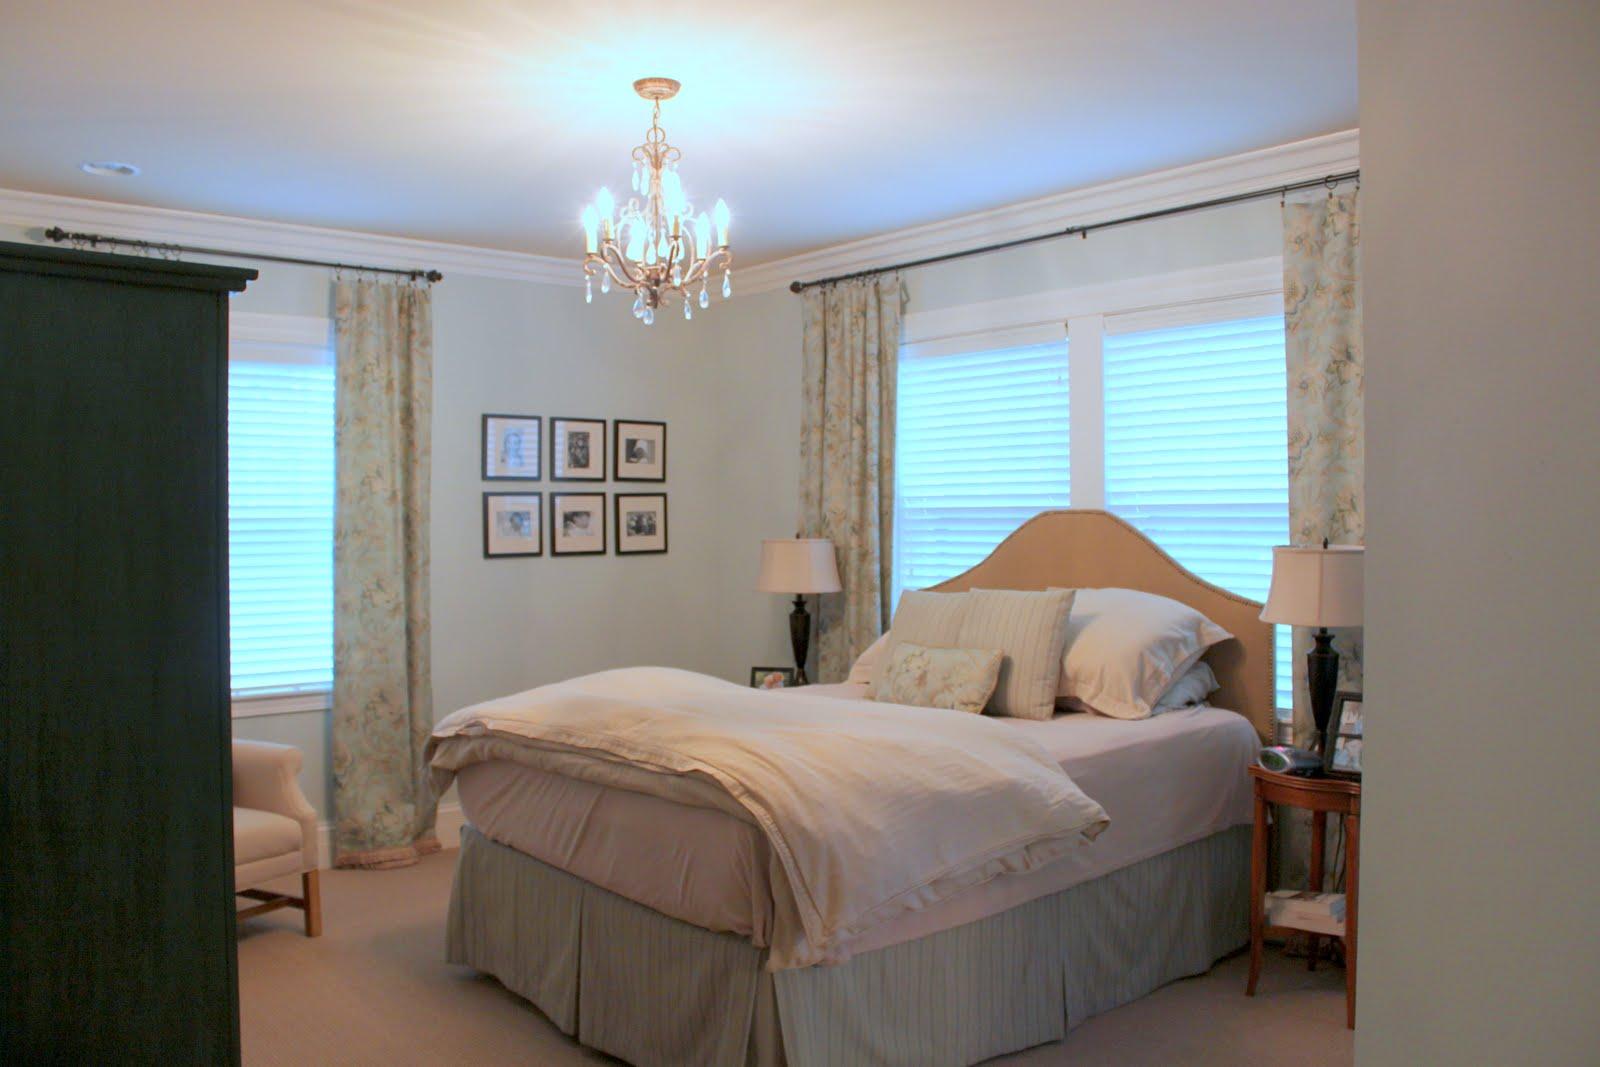 oak ridge revival paint colors. Black Bedroom Furniture Sets. Home Design Ideas